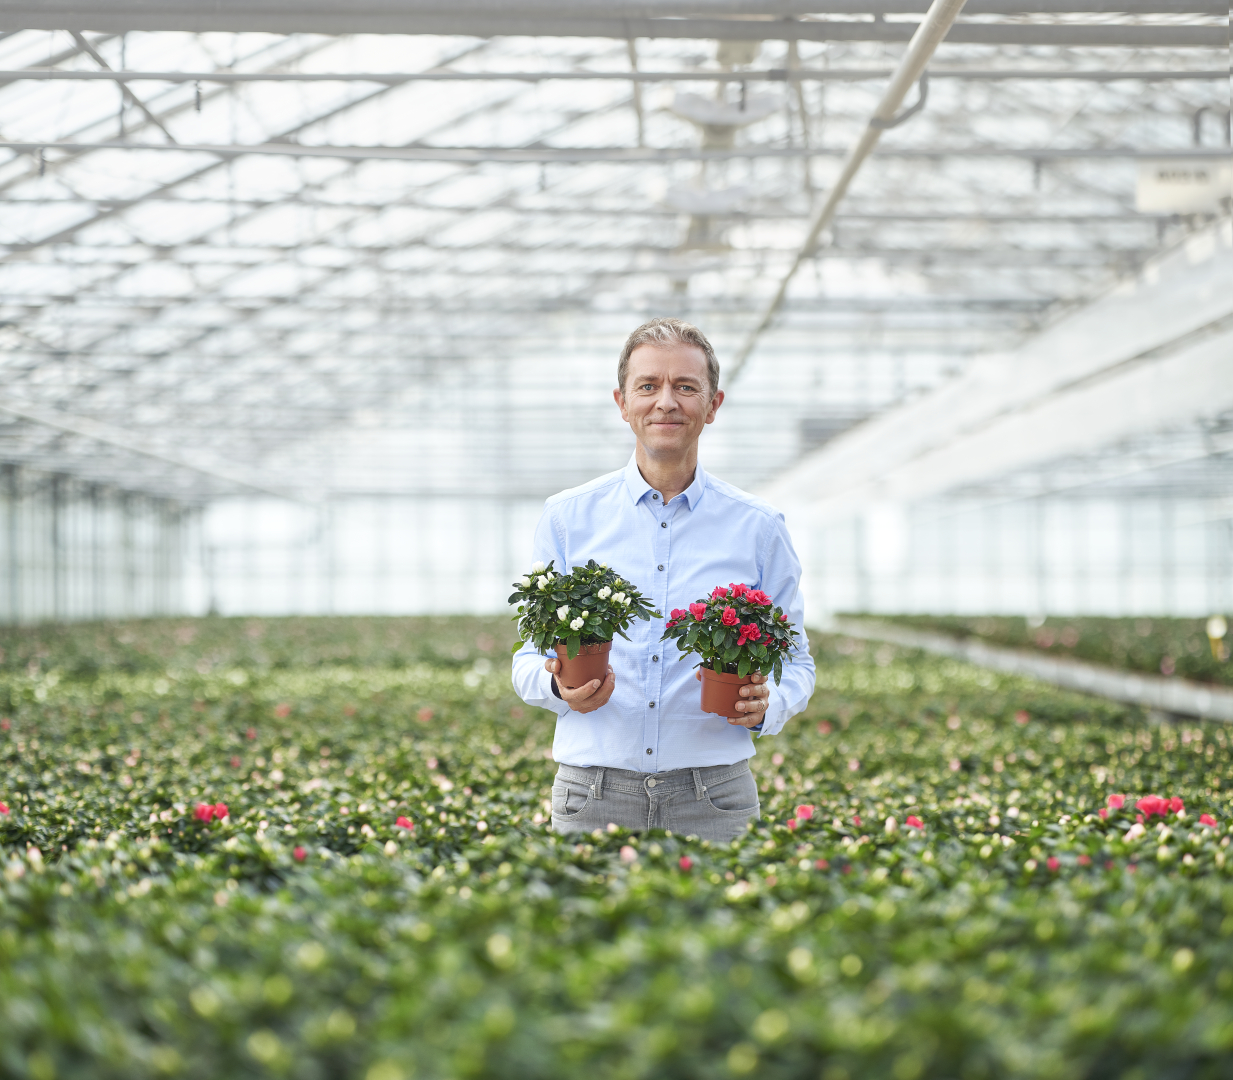 Campagnebeeld Plantjesweekend Kom op tegen kanker